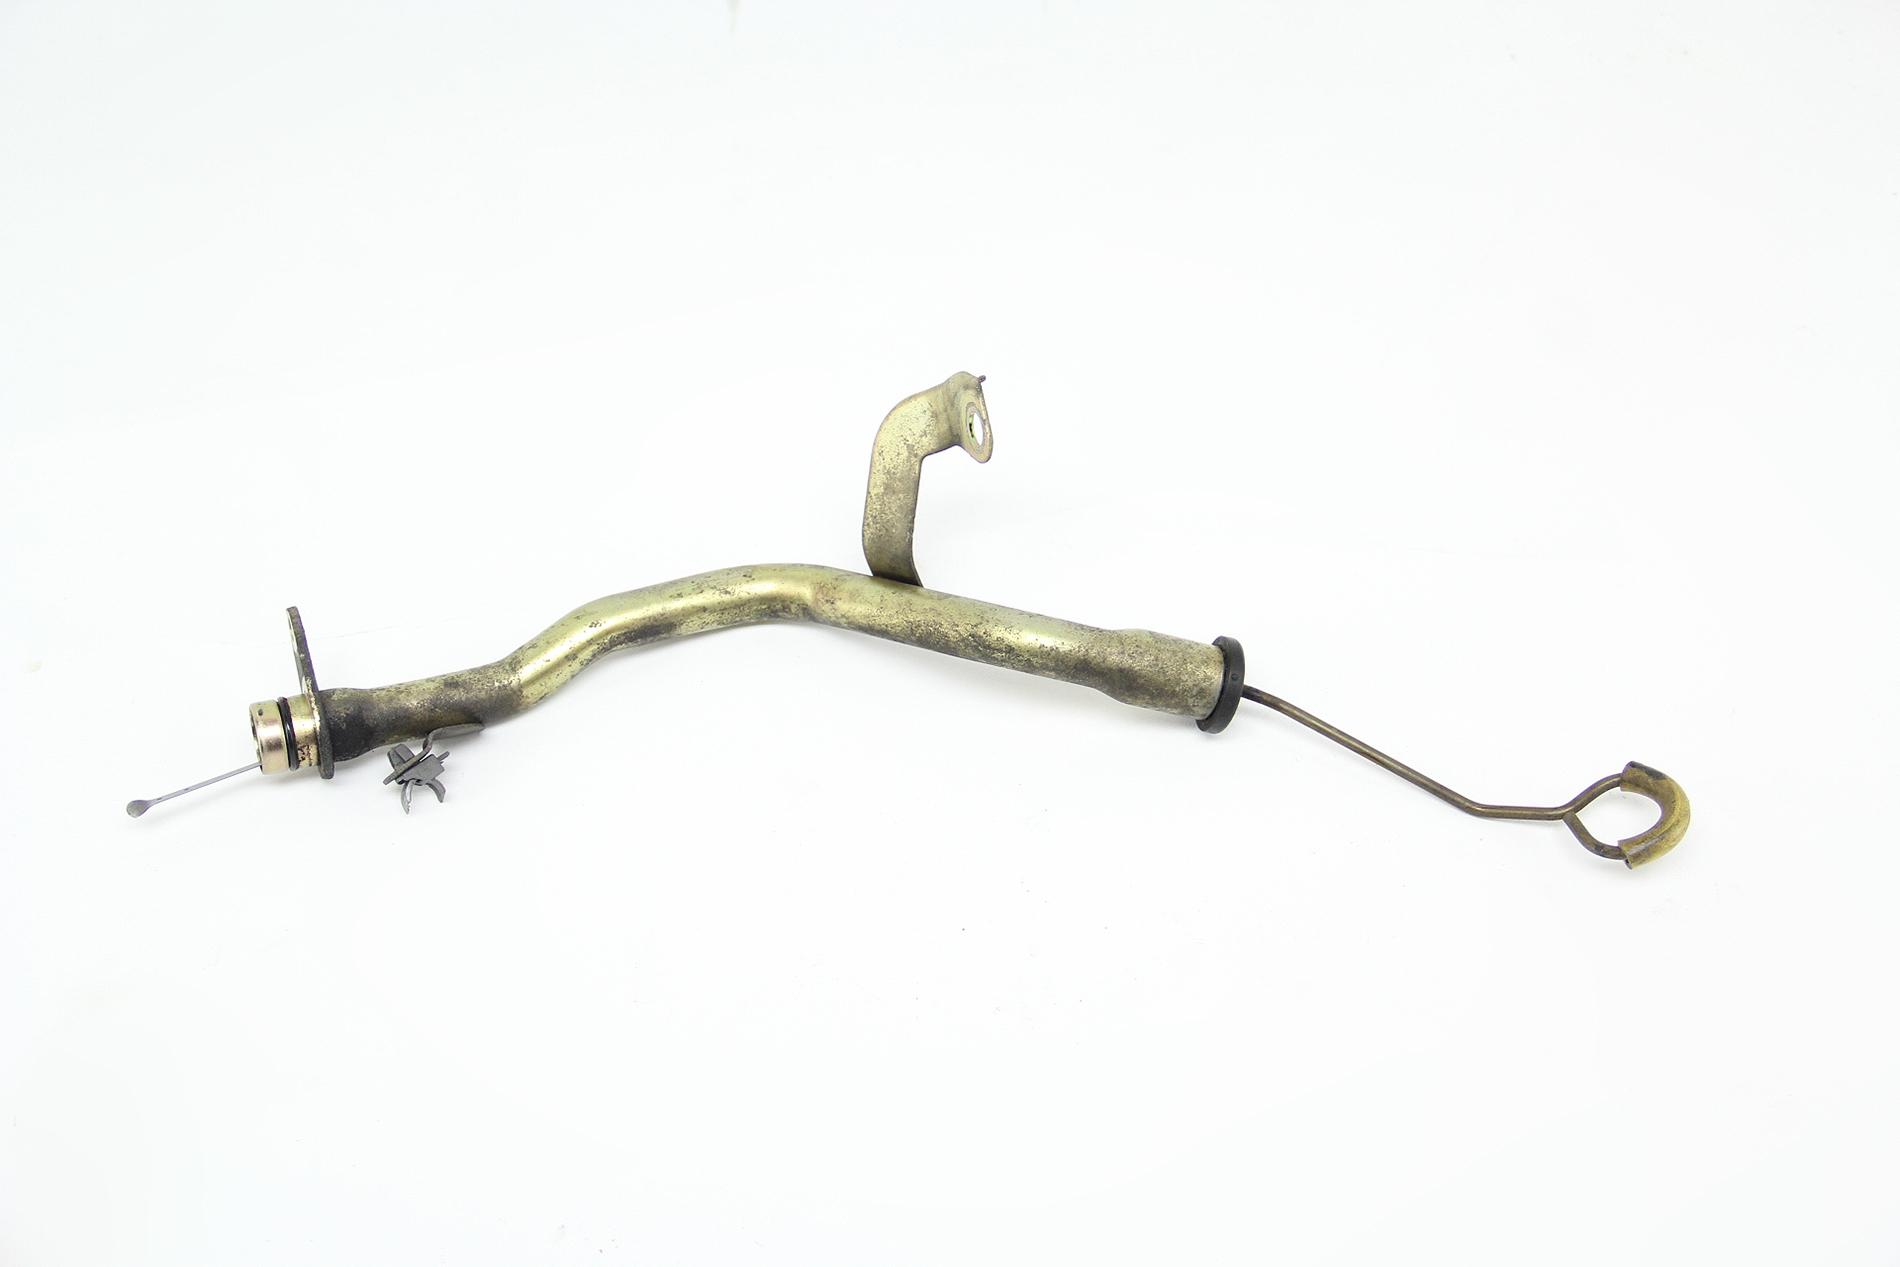 Honda Accord 03 07 Auto Transmission Oil Dipstick 2 4l 4